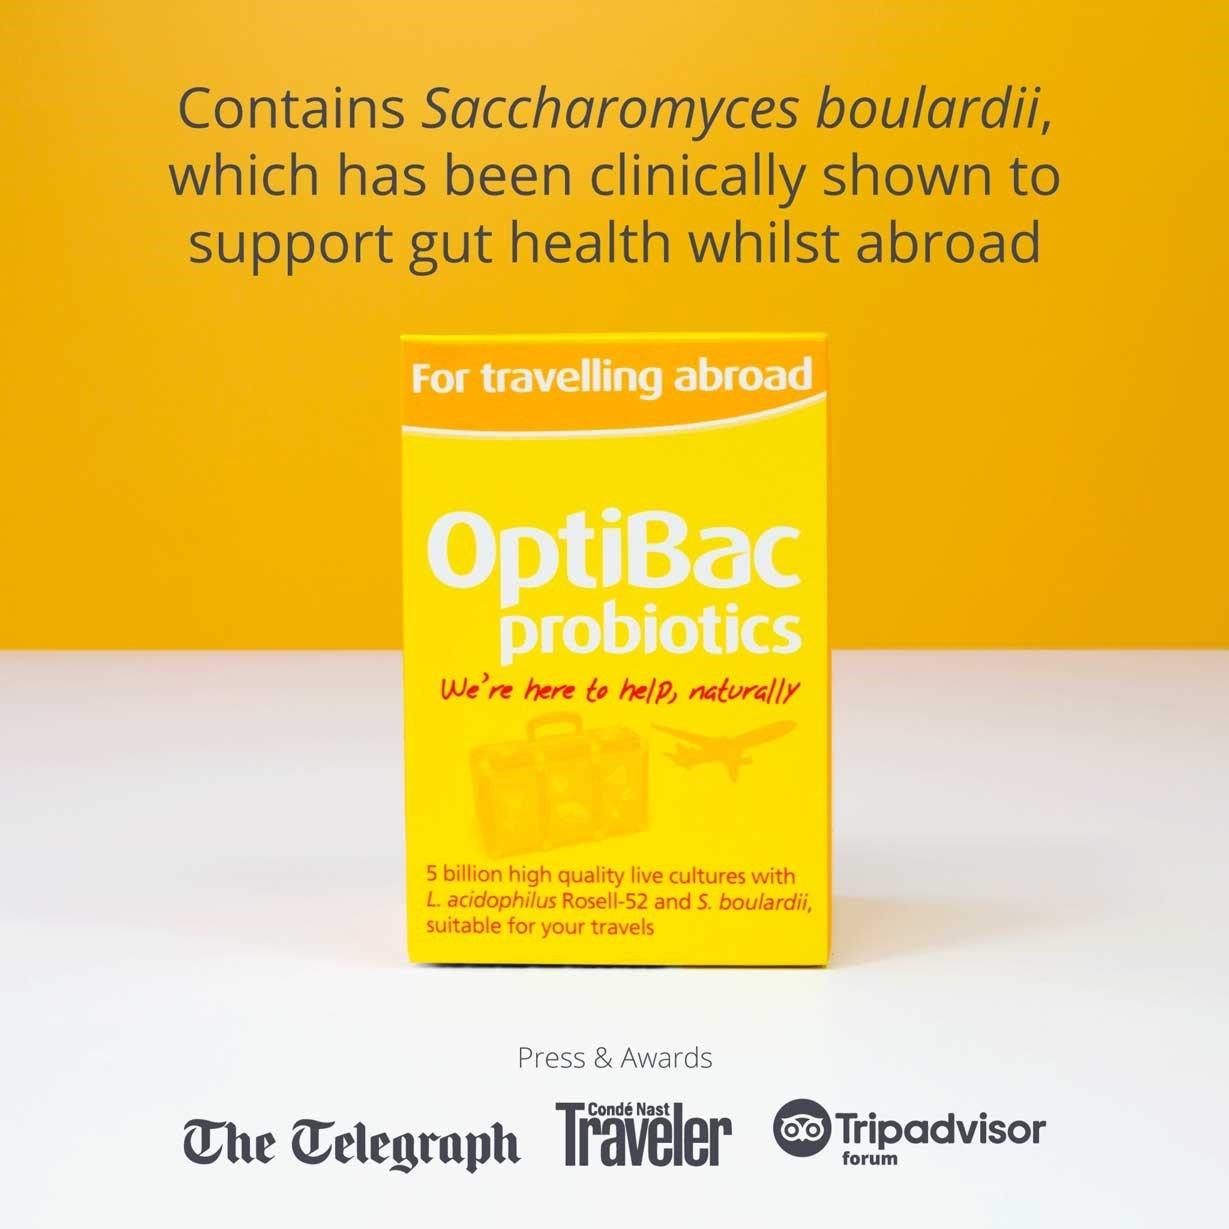 Optibac Probiotics For travelling abroad press